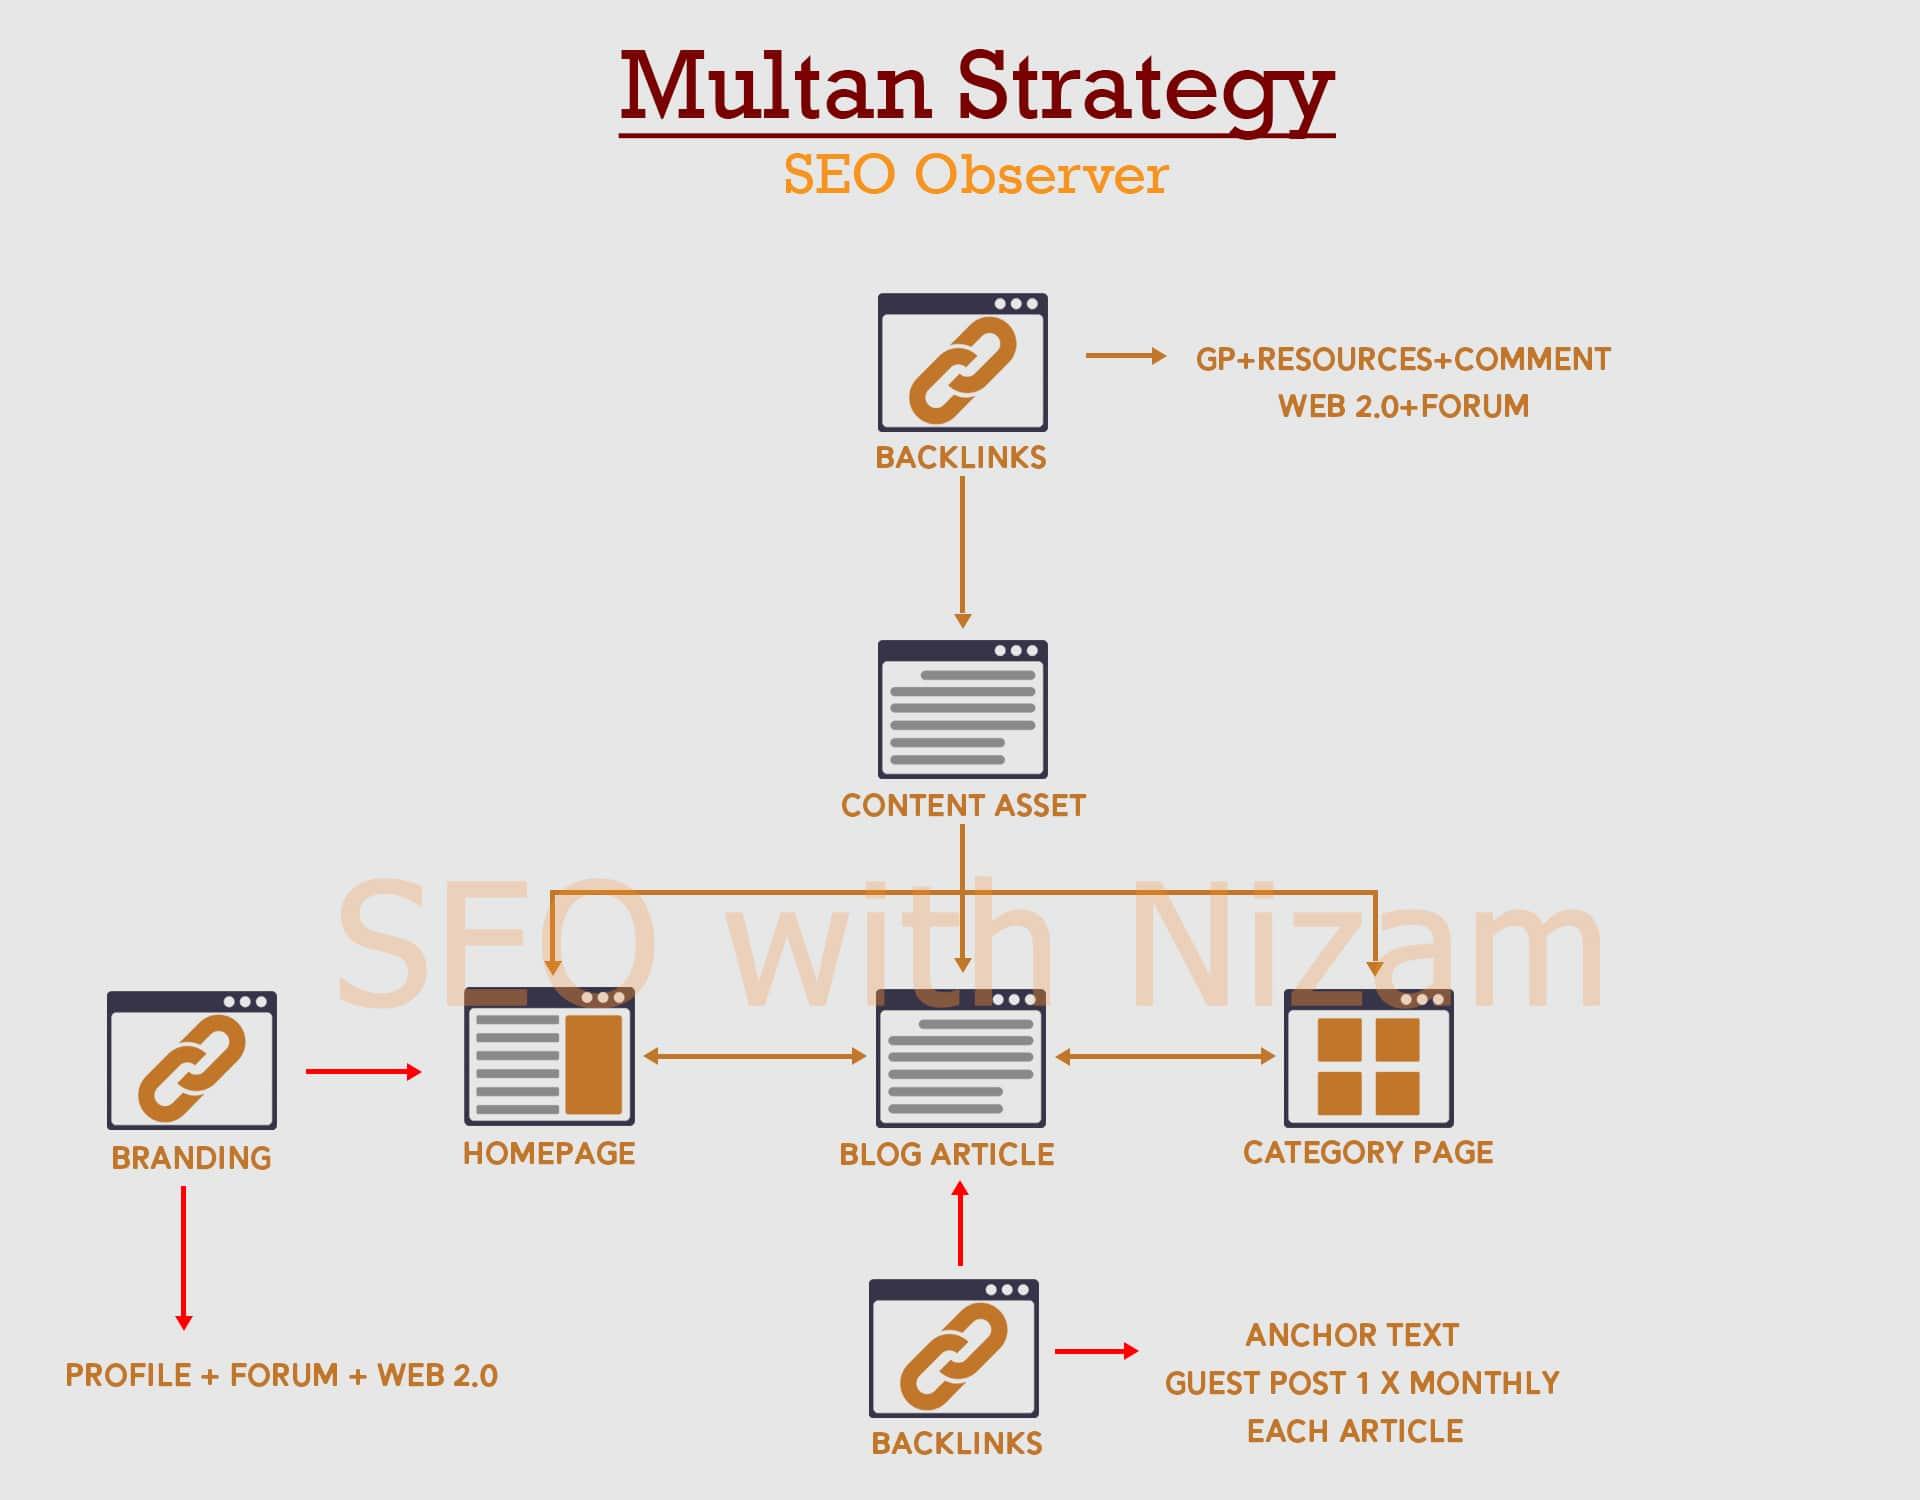 Mutan SEO Strategy